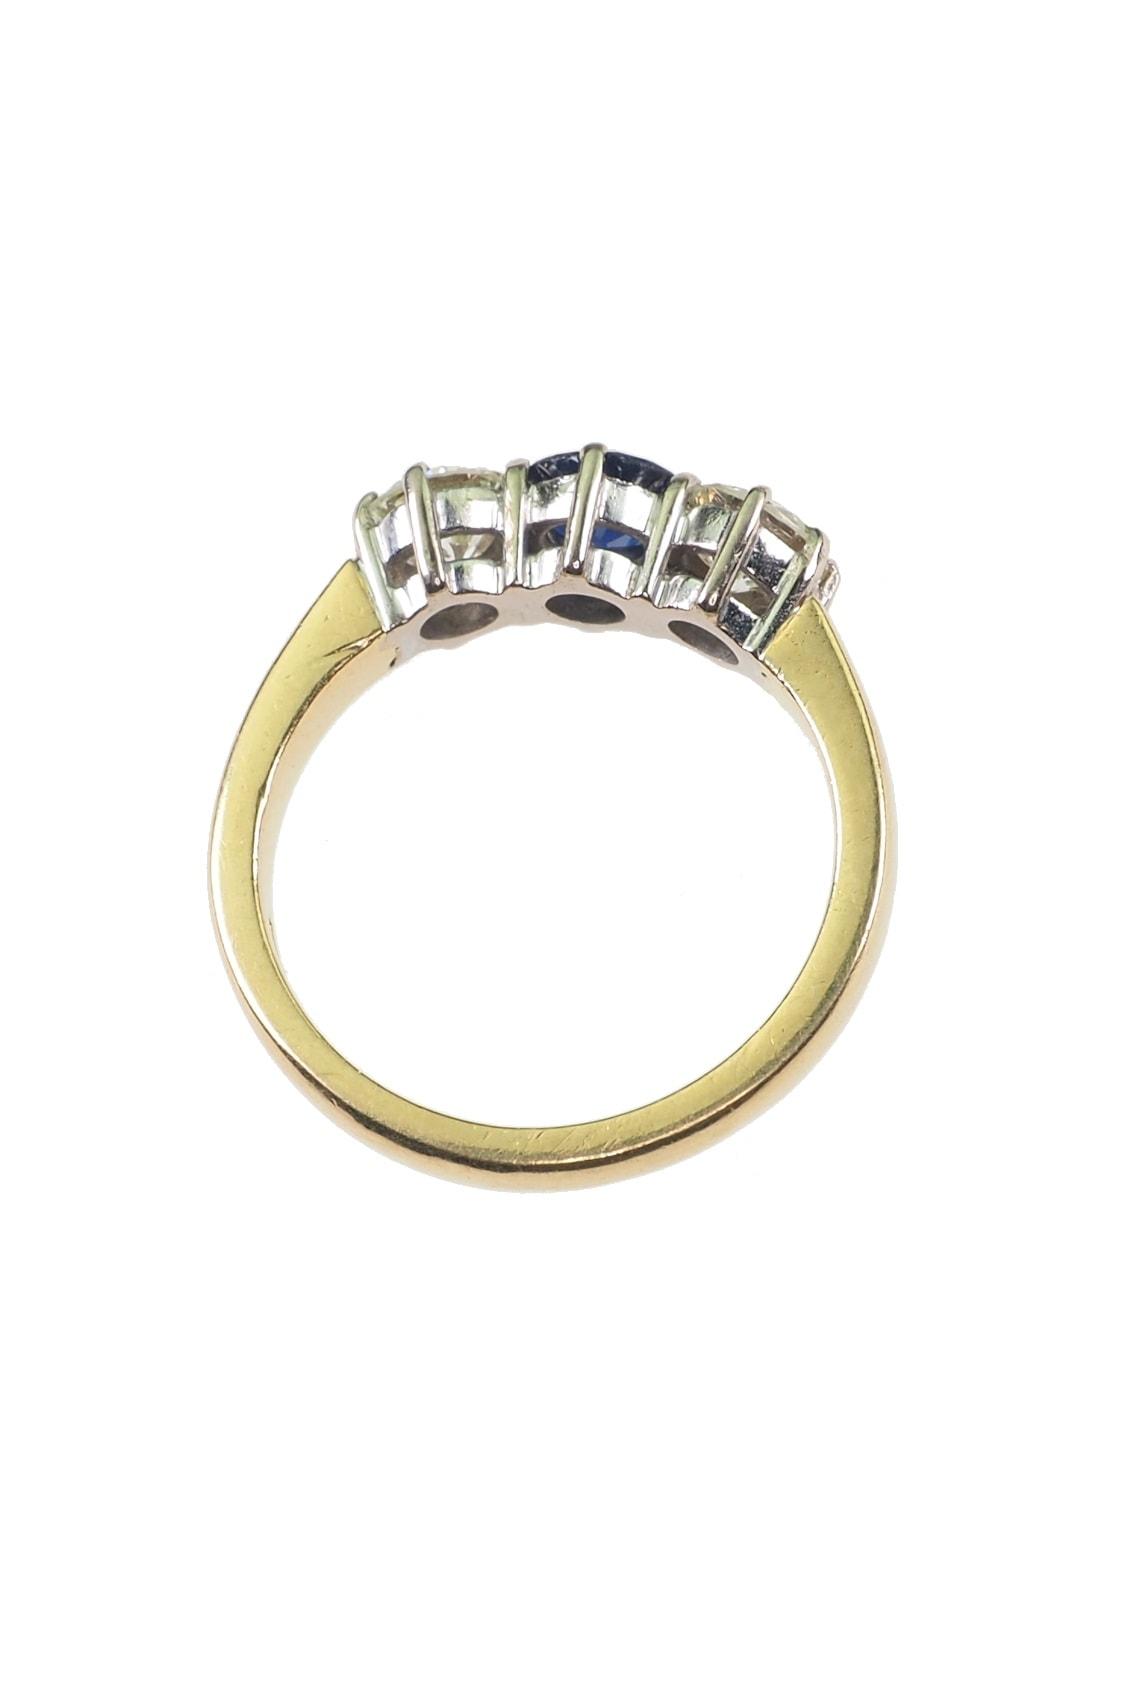 antike-Ringe-onlineshop-3505c